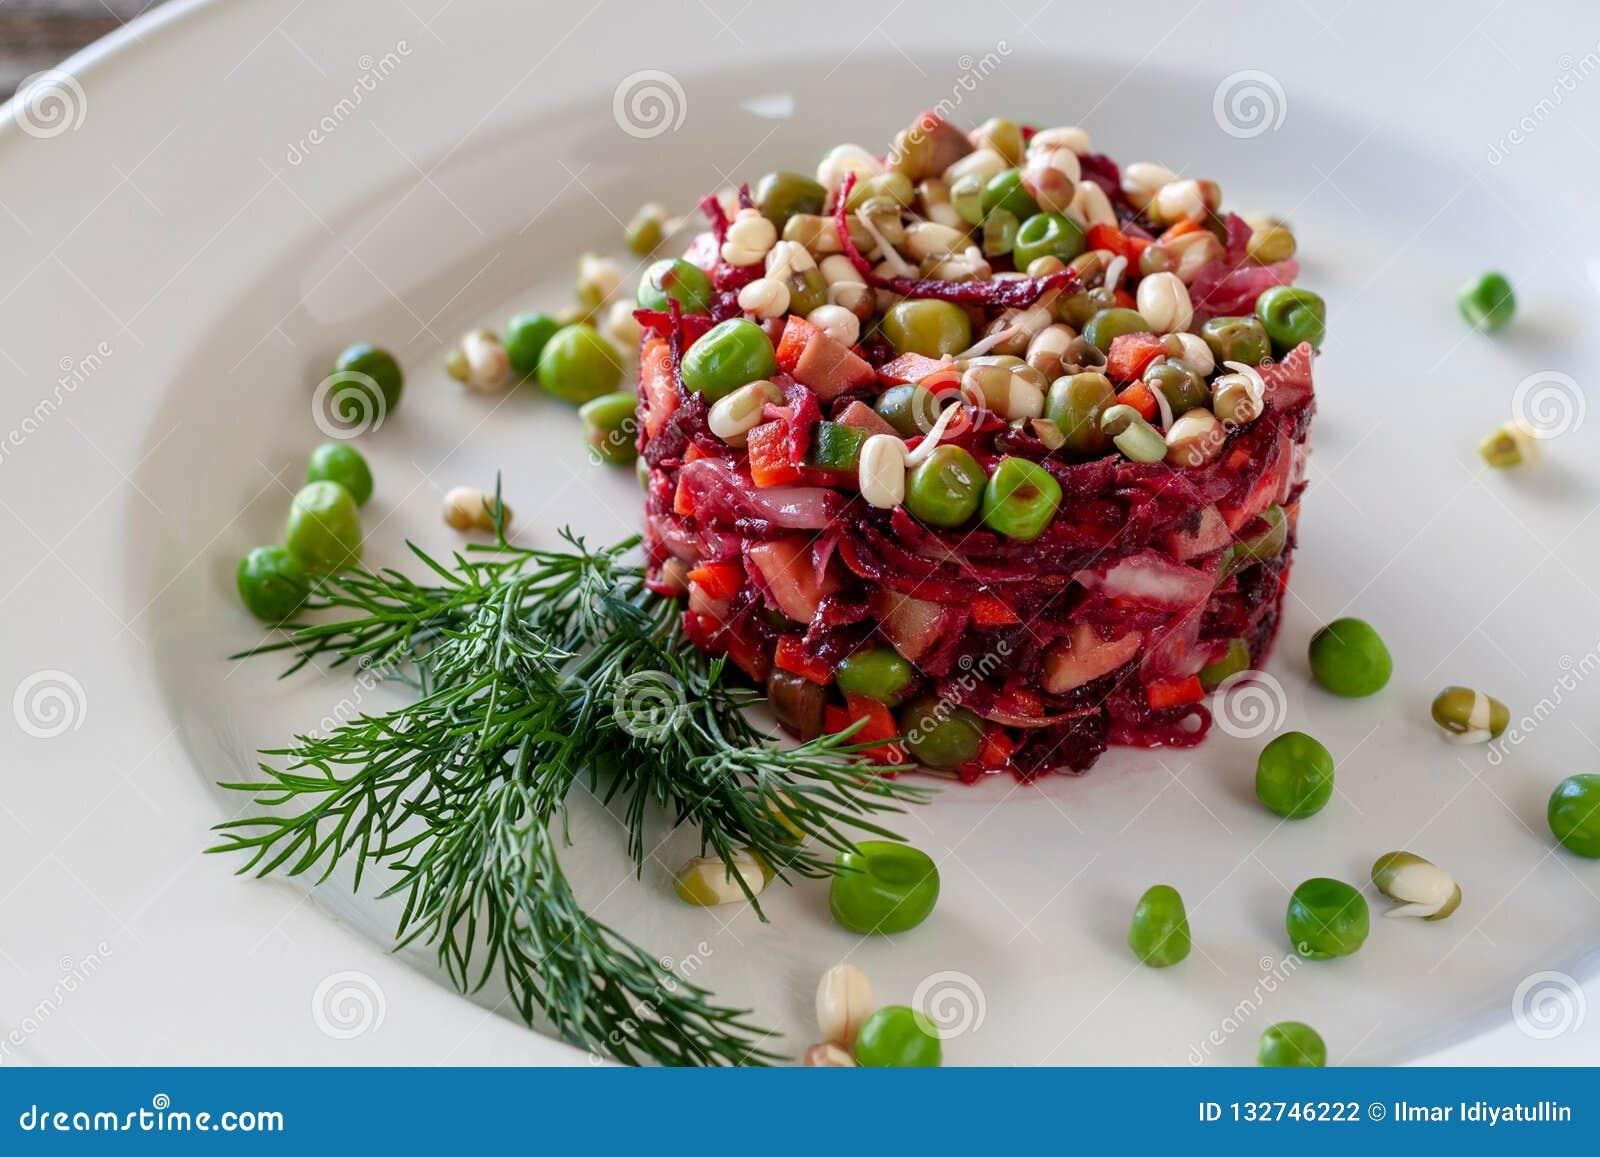 Vegetarian dish: Vinaigrette salad of beets, carrots, sauerkraut